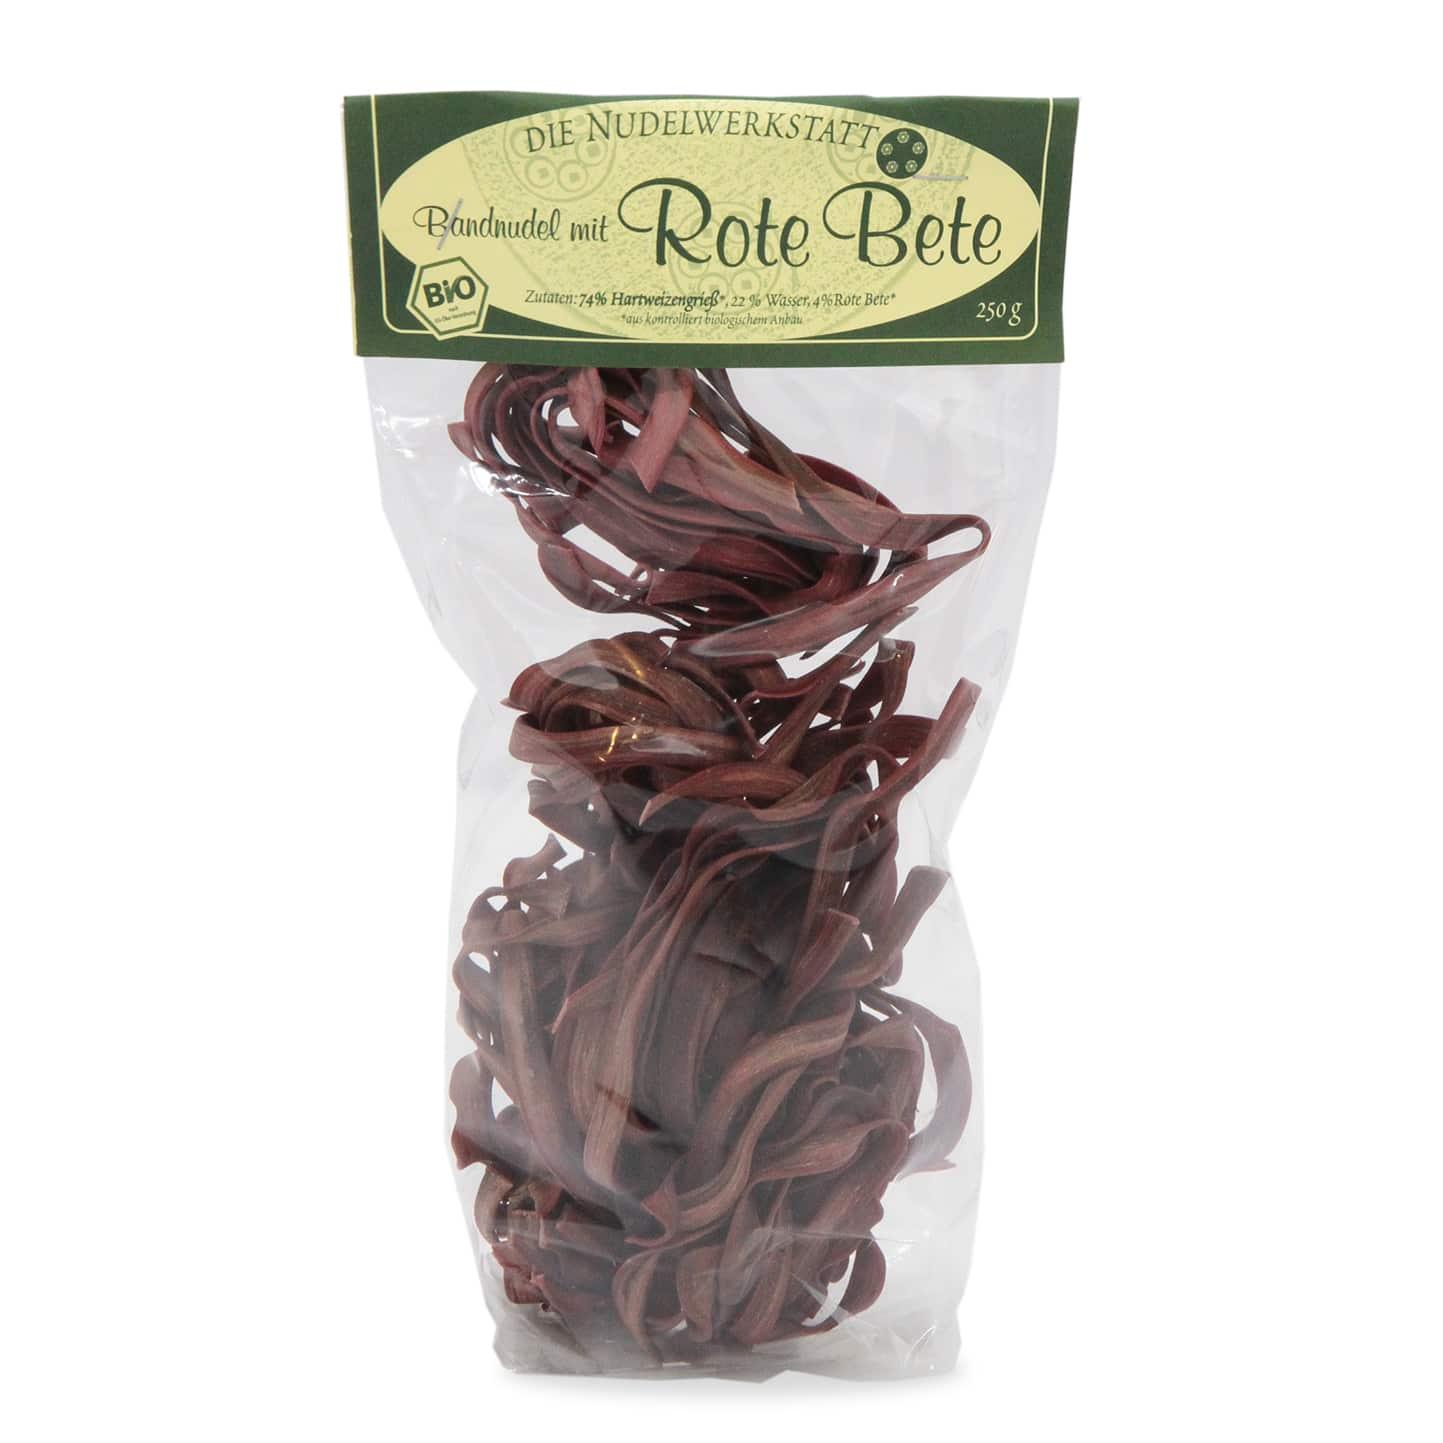 BandnudelnRote Beete 250 g